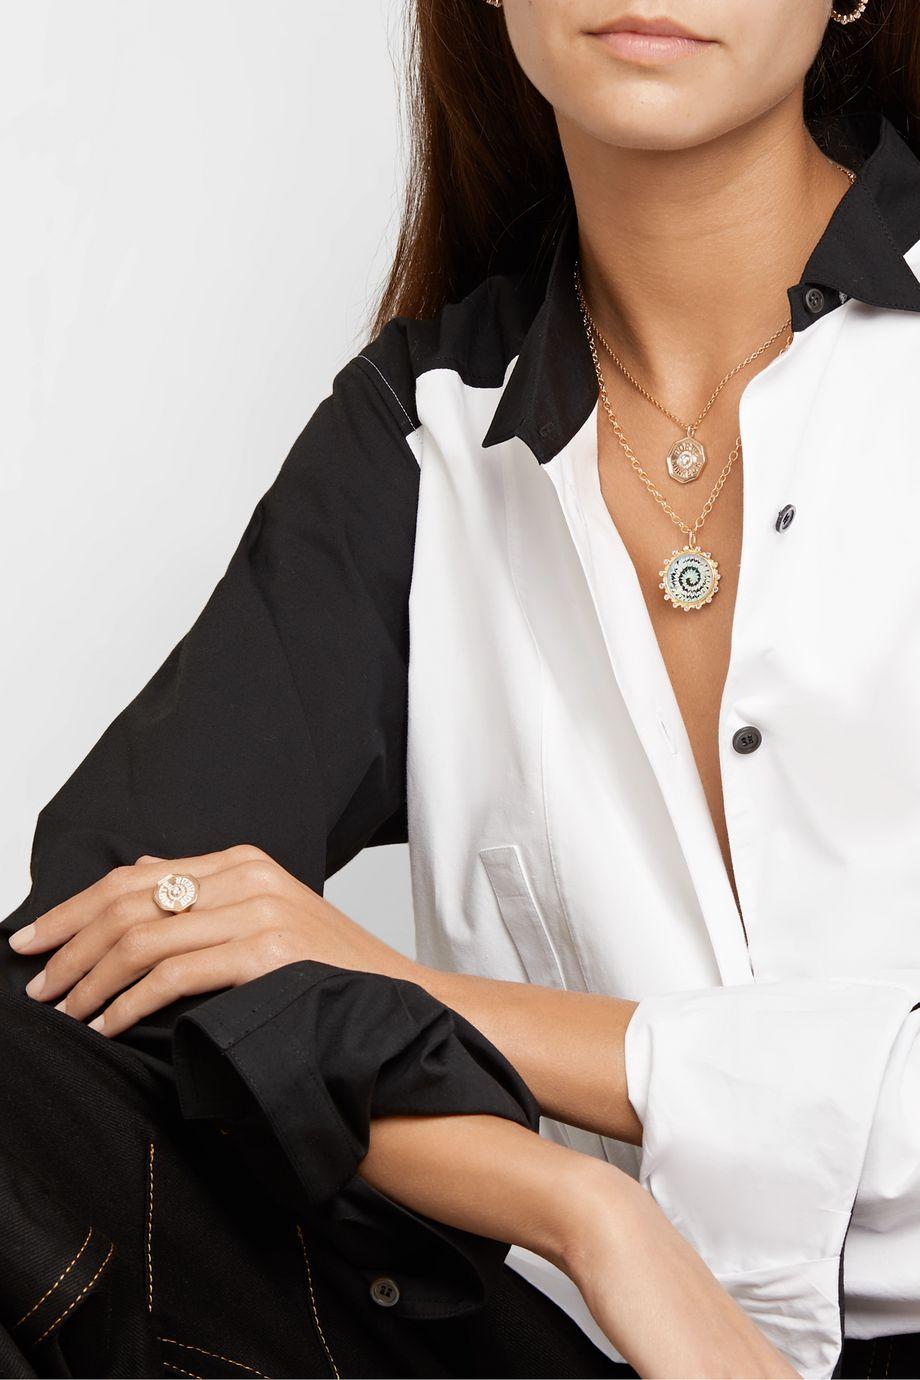 Marlo Laz Tie Dye 14-karat gold, enamel and tanzanite necklace